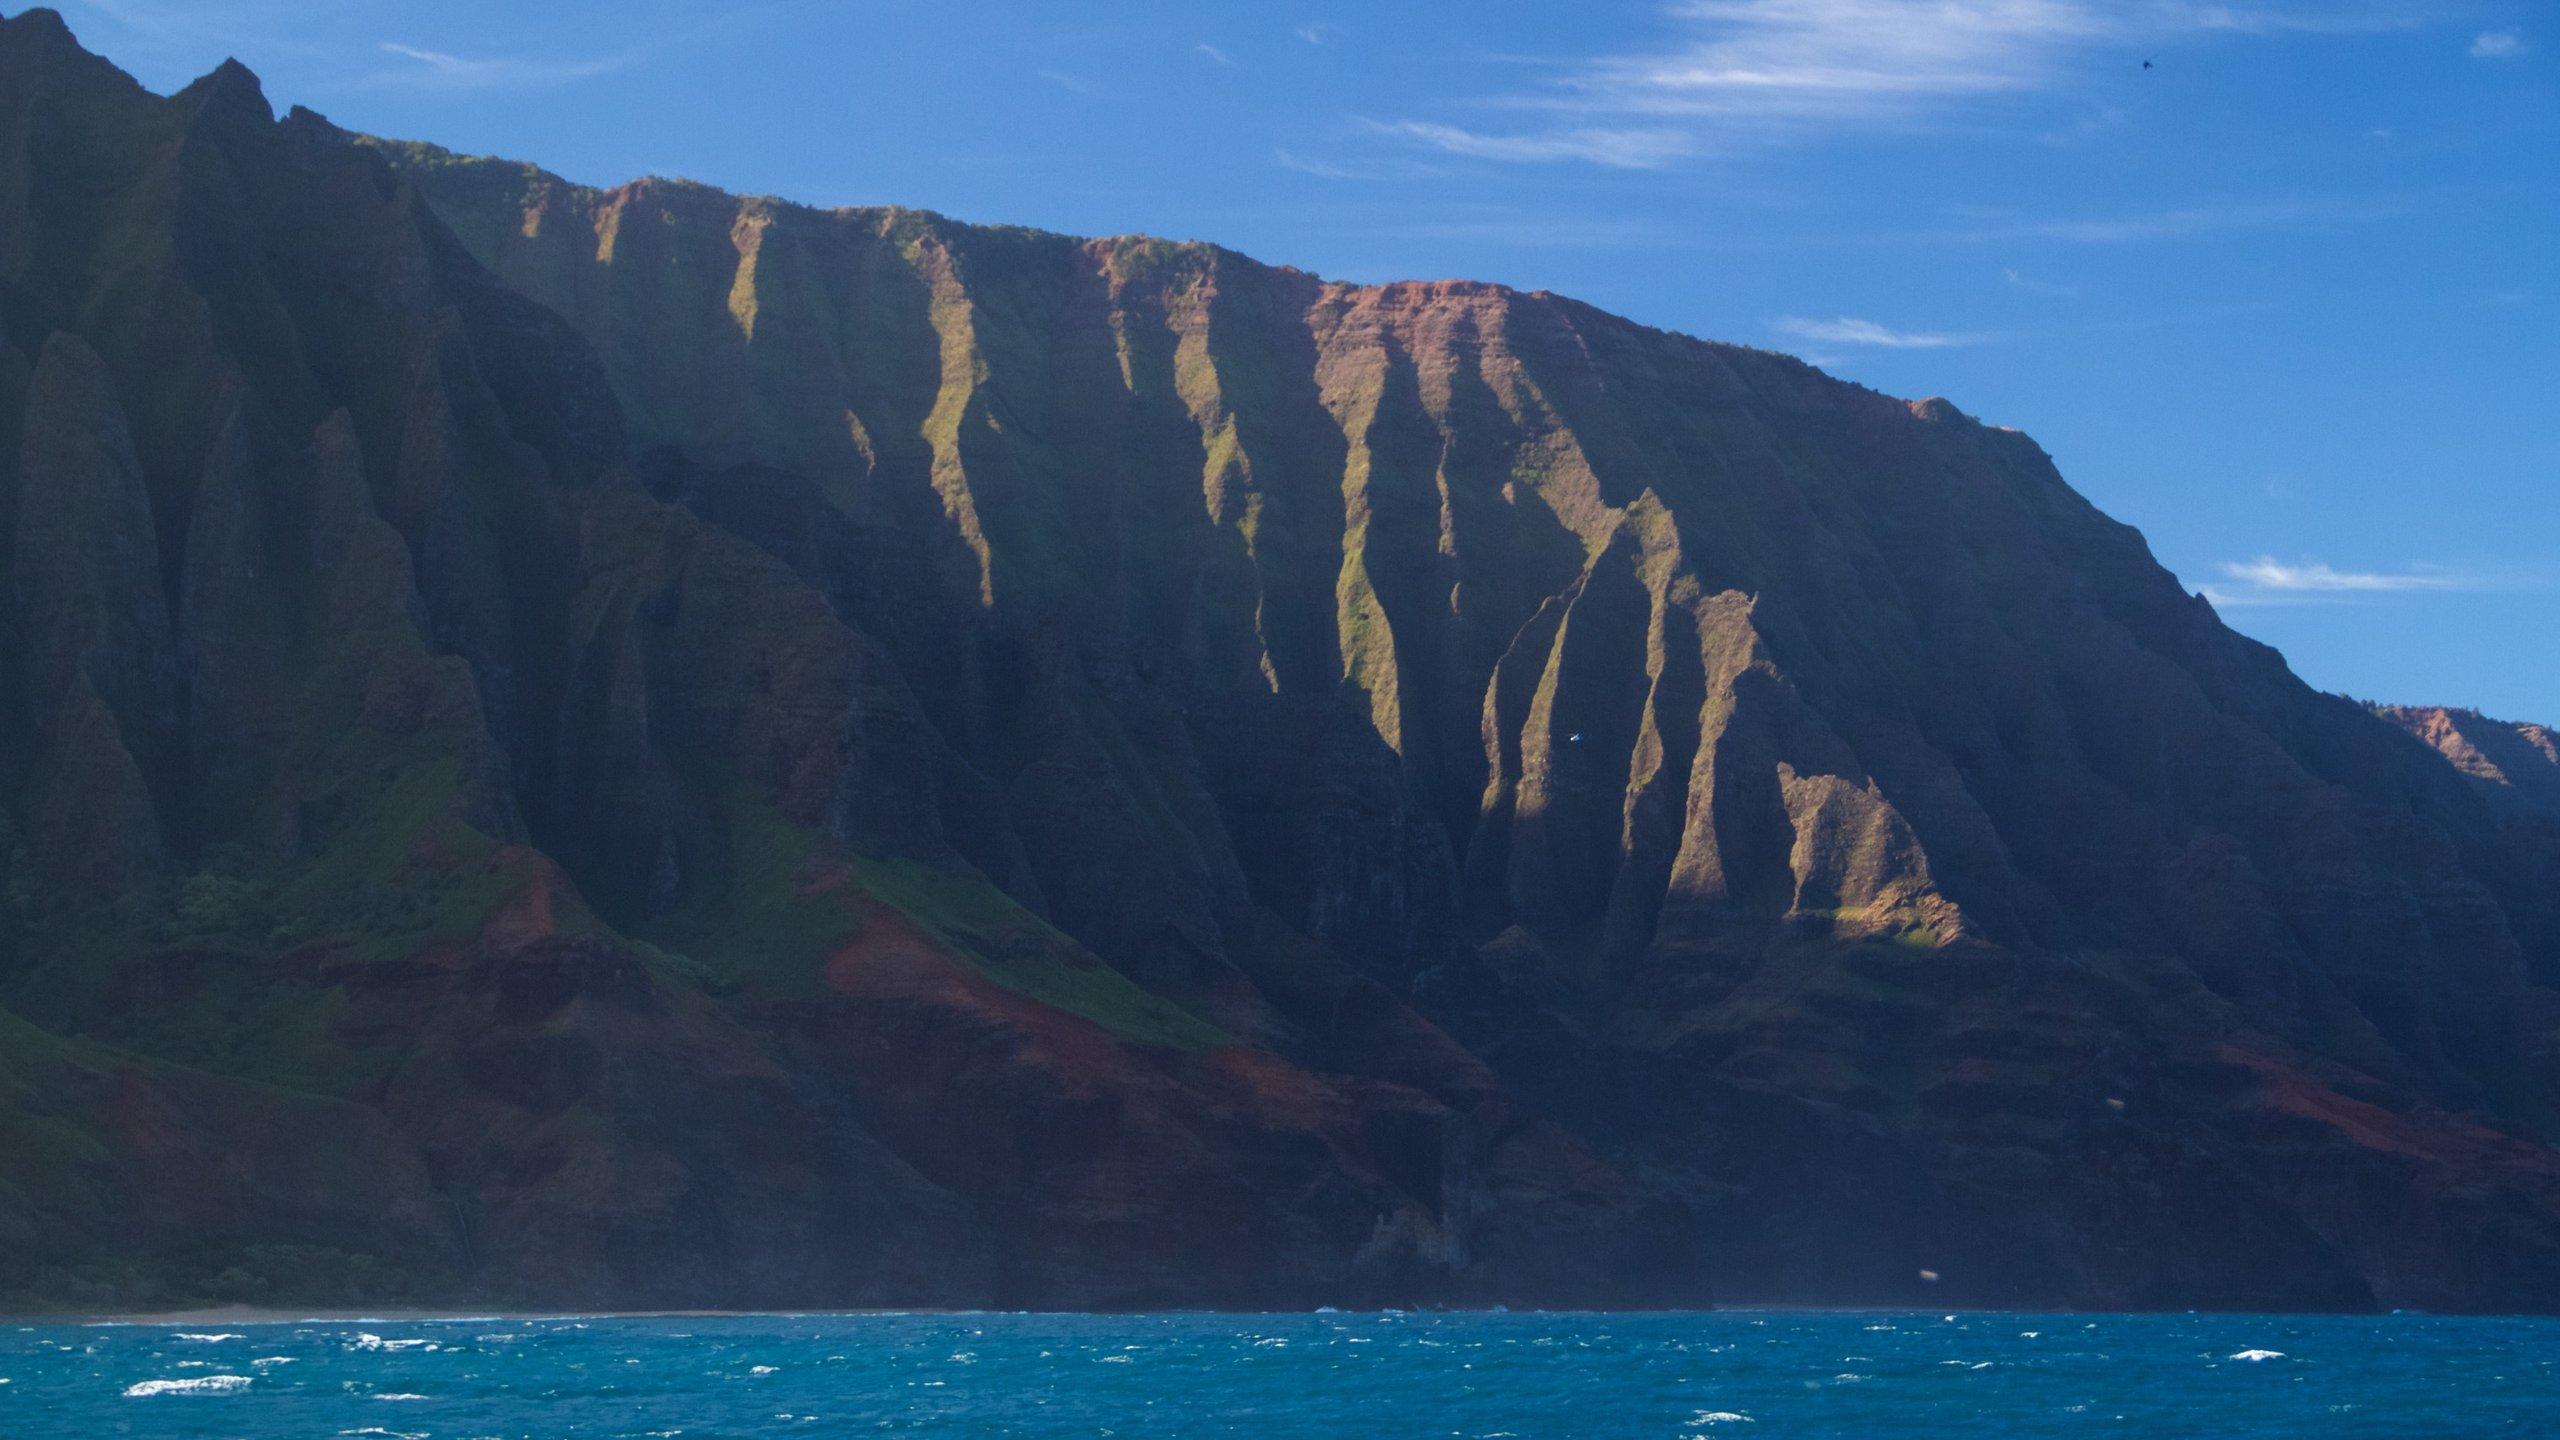 Kauai County, Hawaii, United States of America